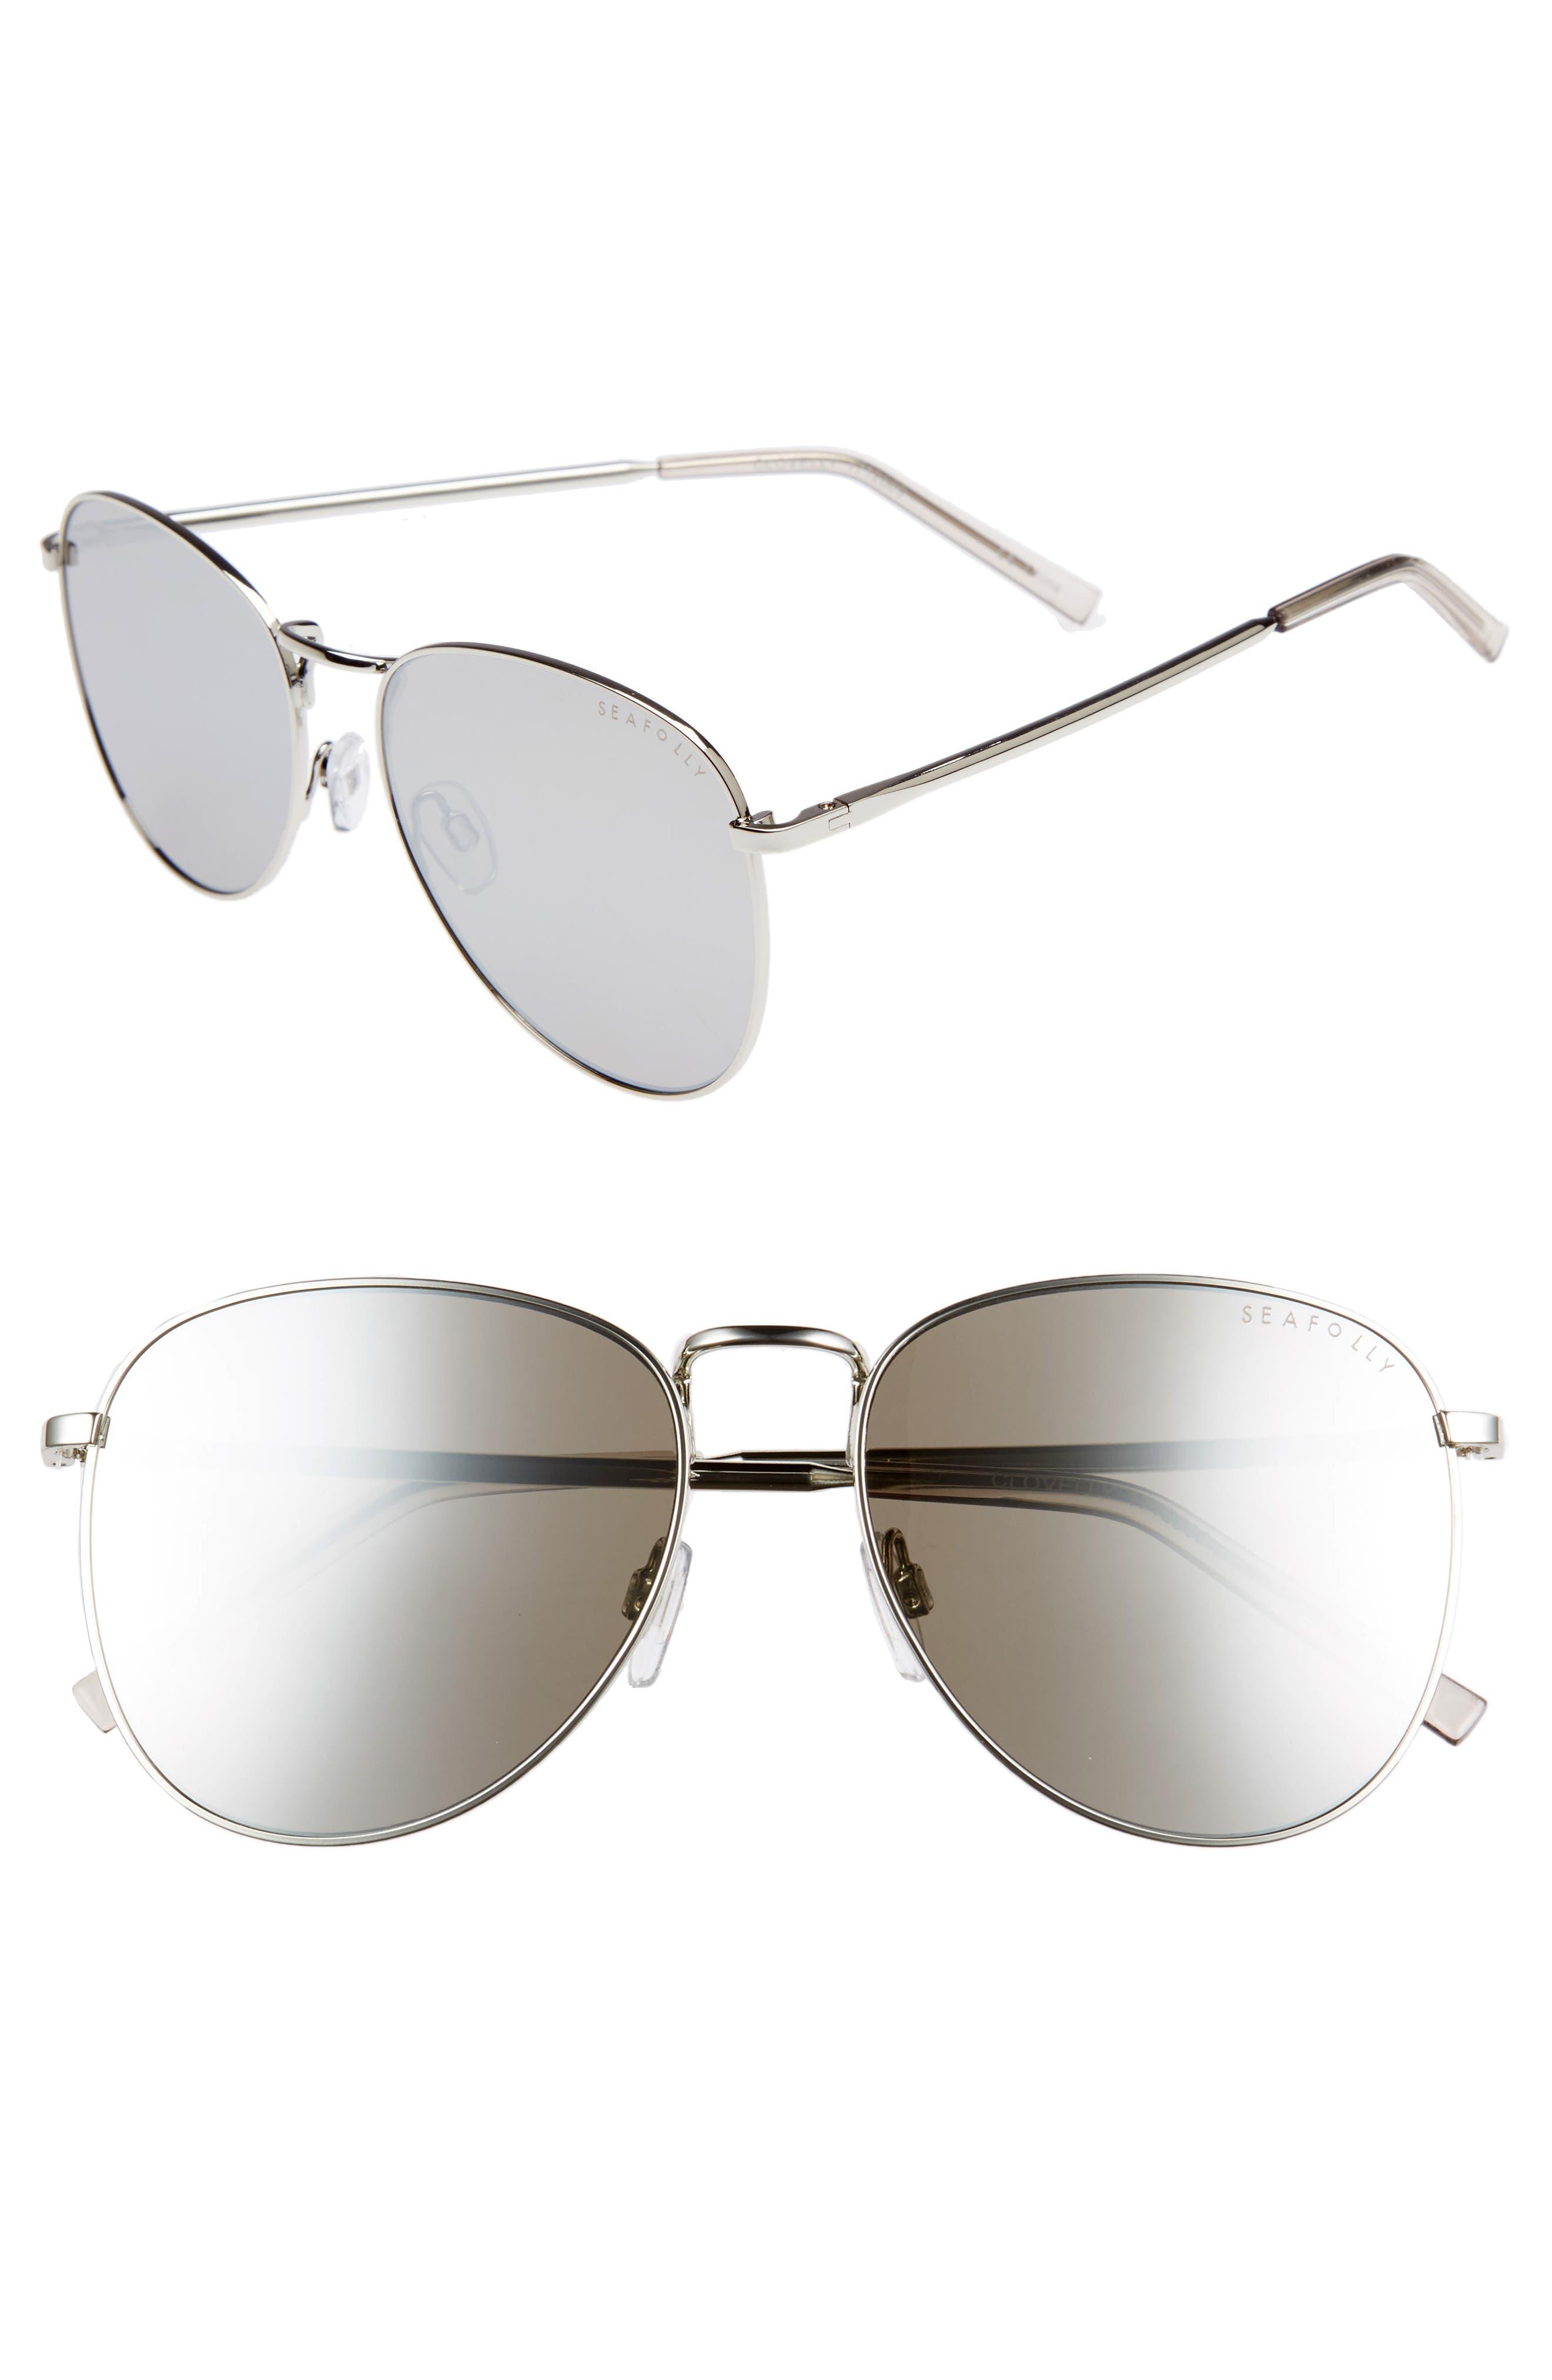 Seafolly Clovelly 56mm Metal Sunglasses